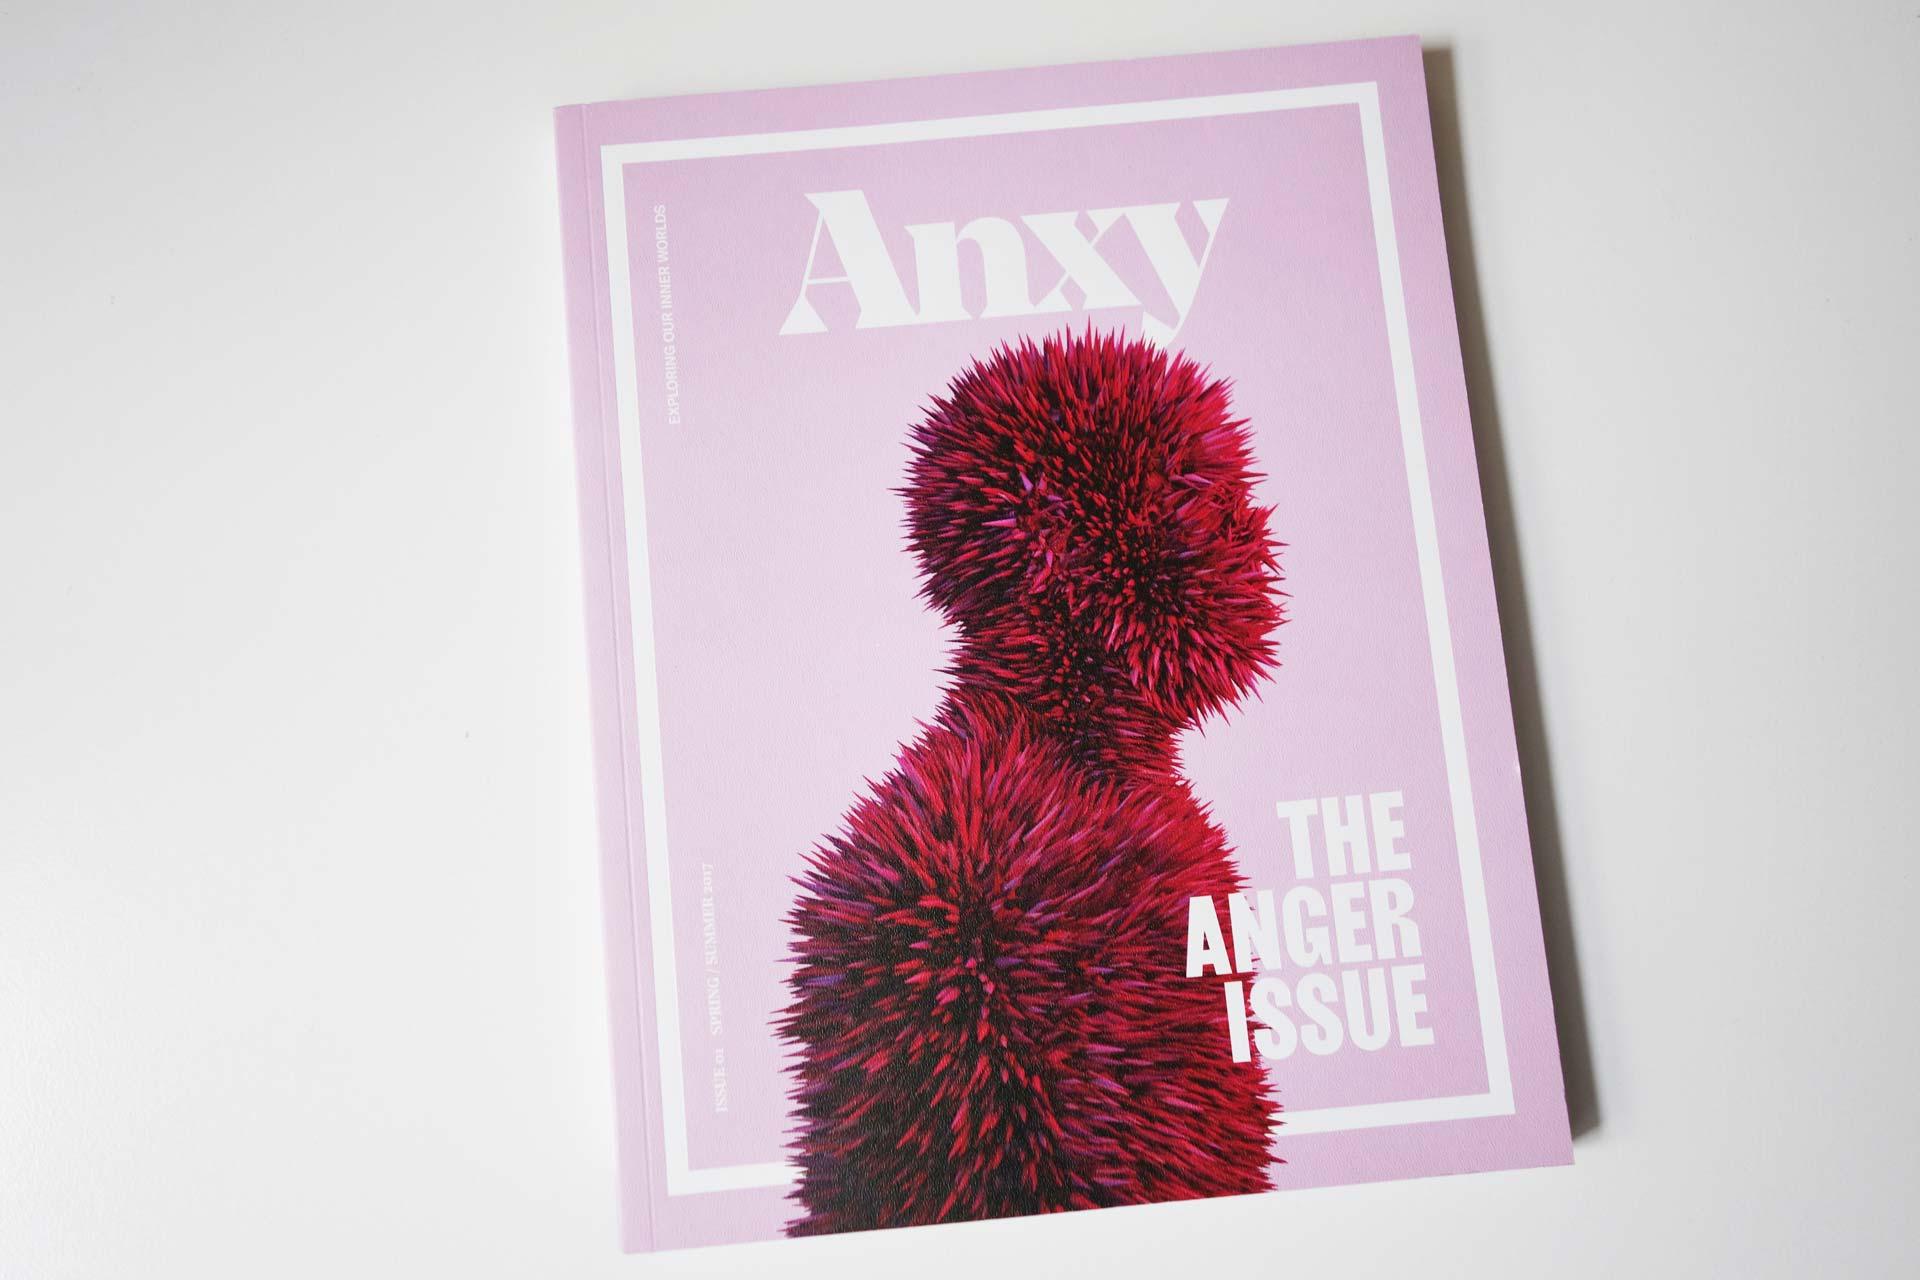 Anxy Magazine